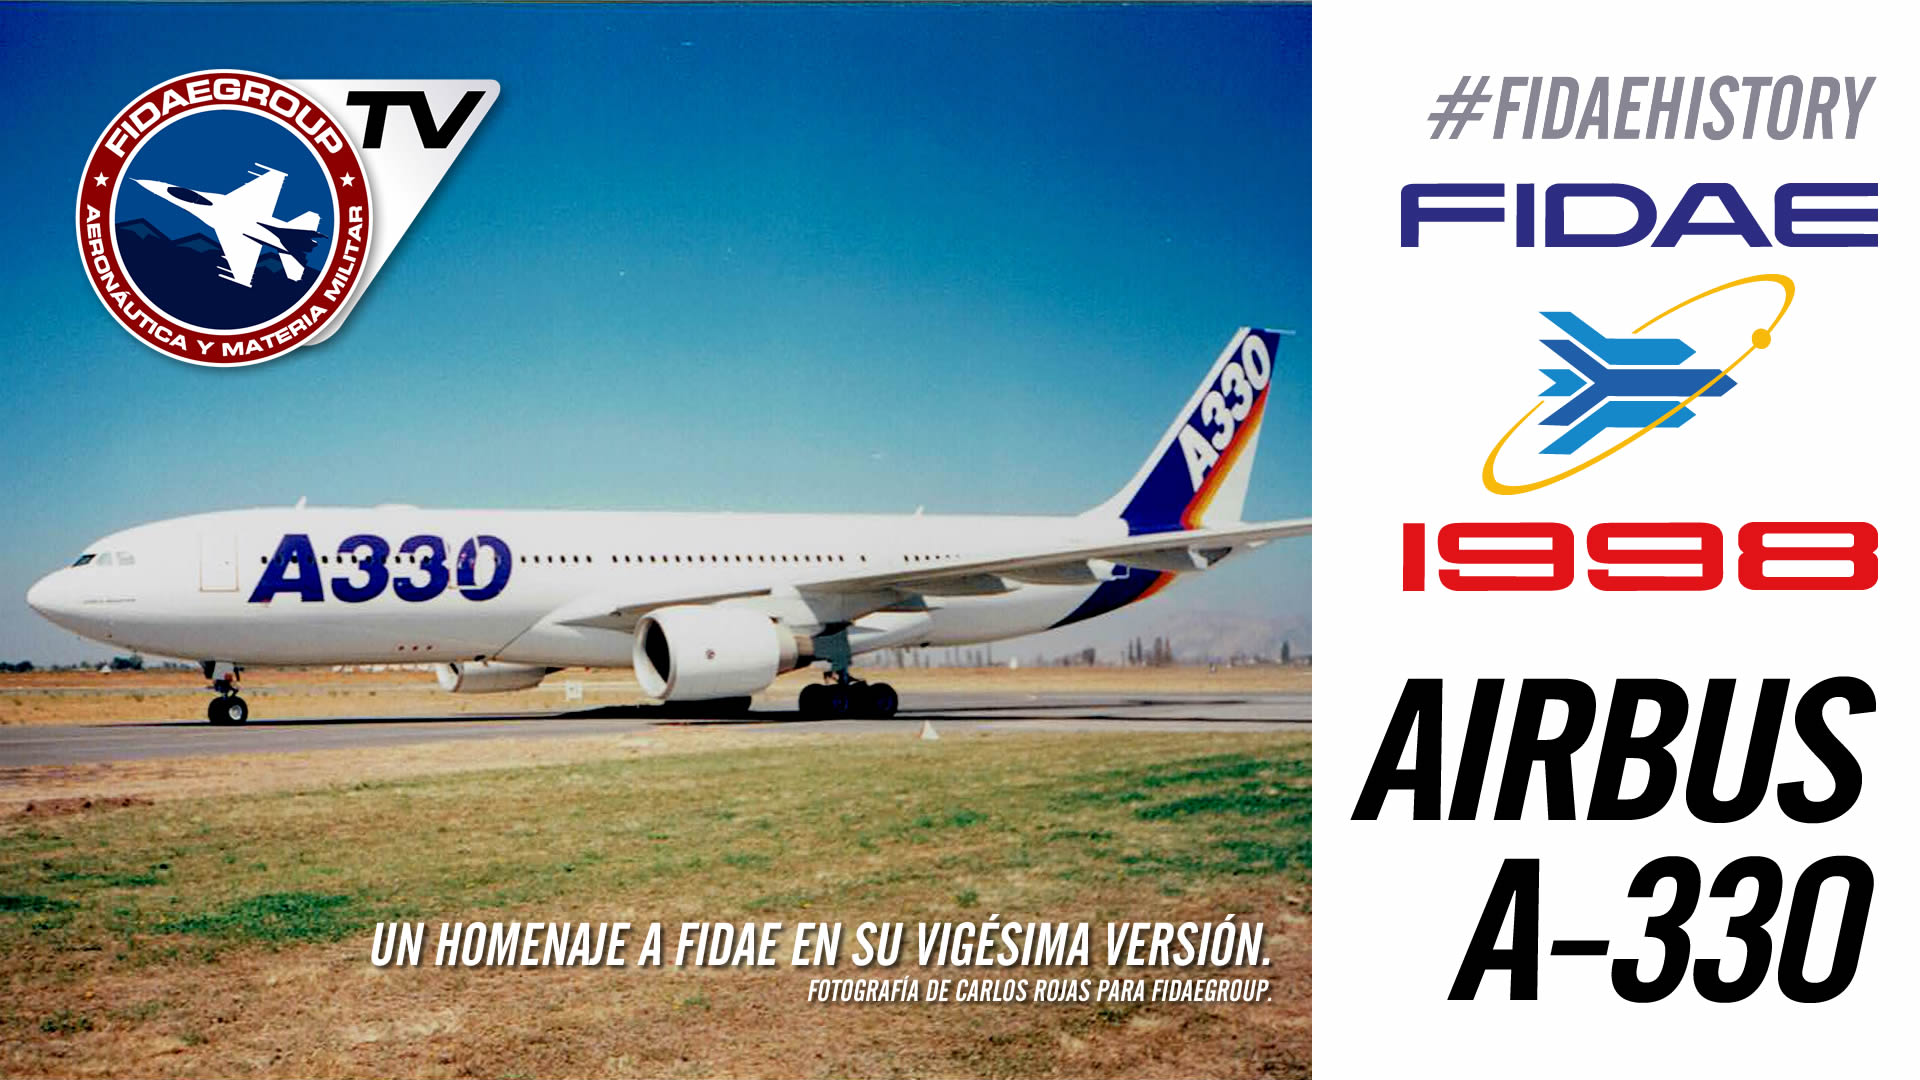 Presentación Airbus A-330 en FIDAE 1998